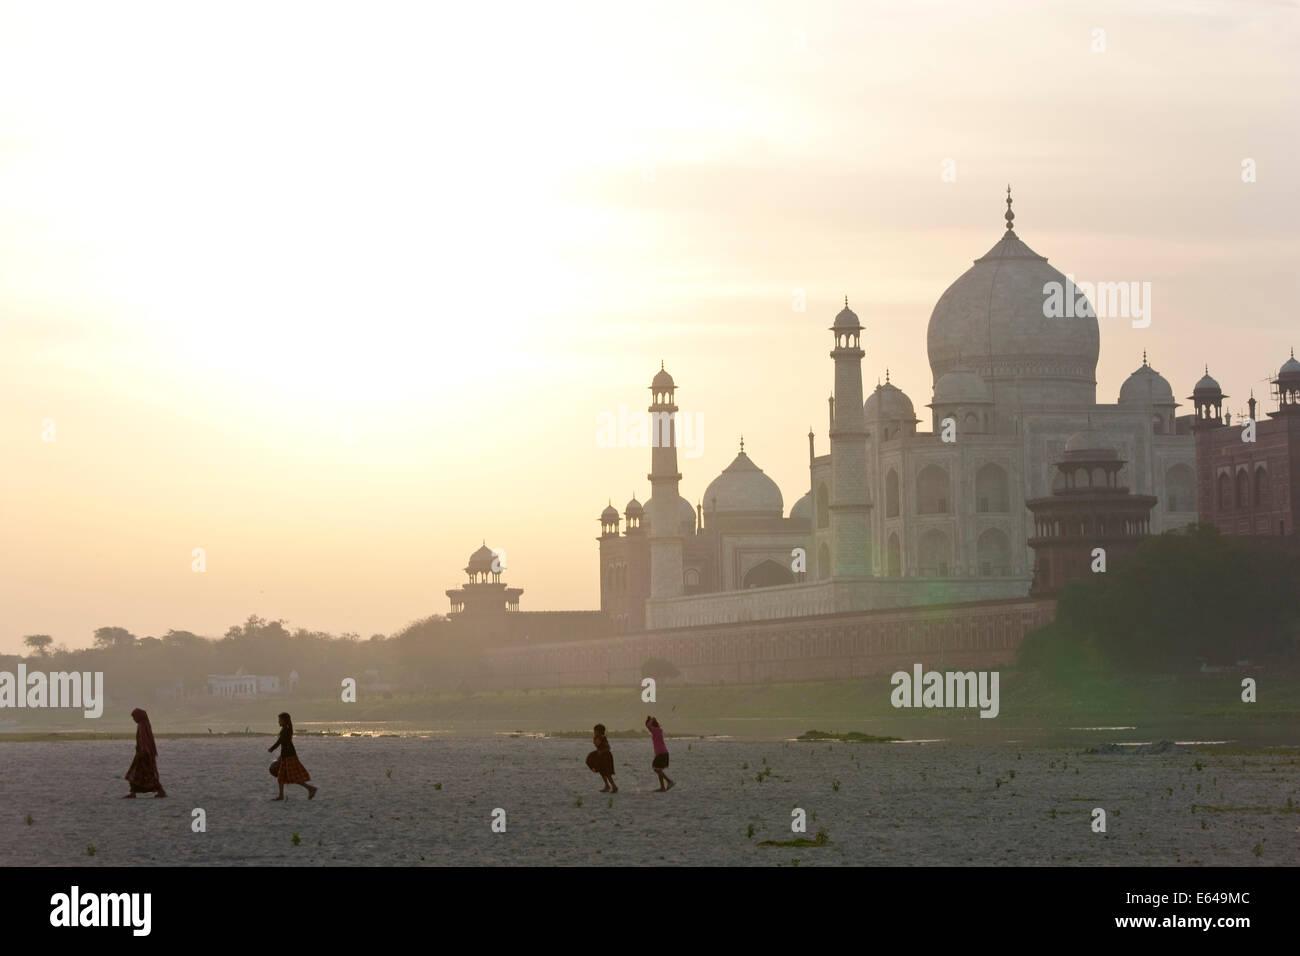 Taj Mahal am Ufer des Flusses Yamuna, Agra, Indien Stockbild